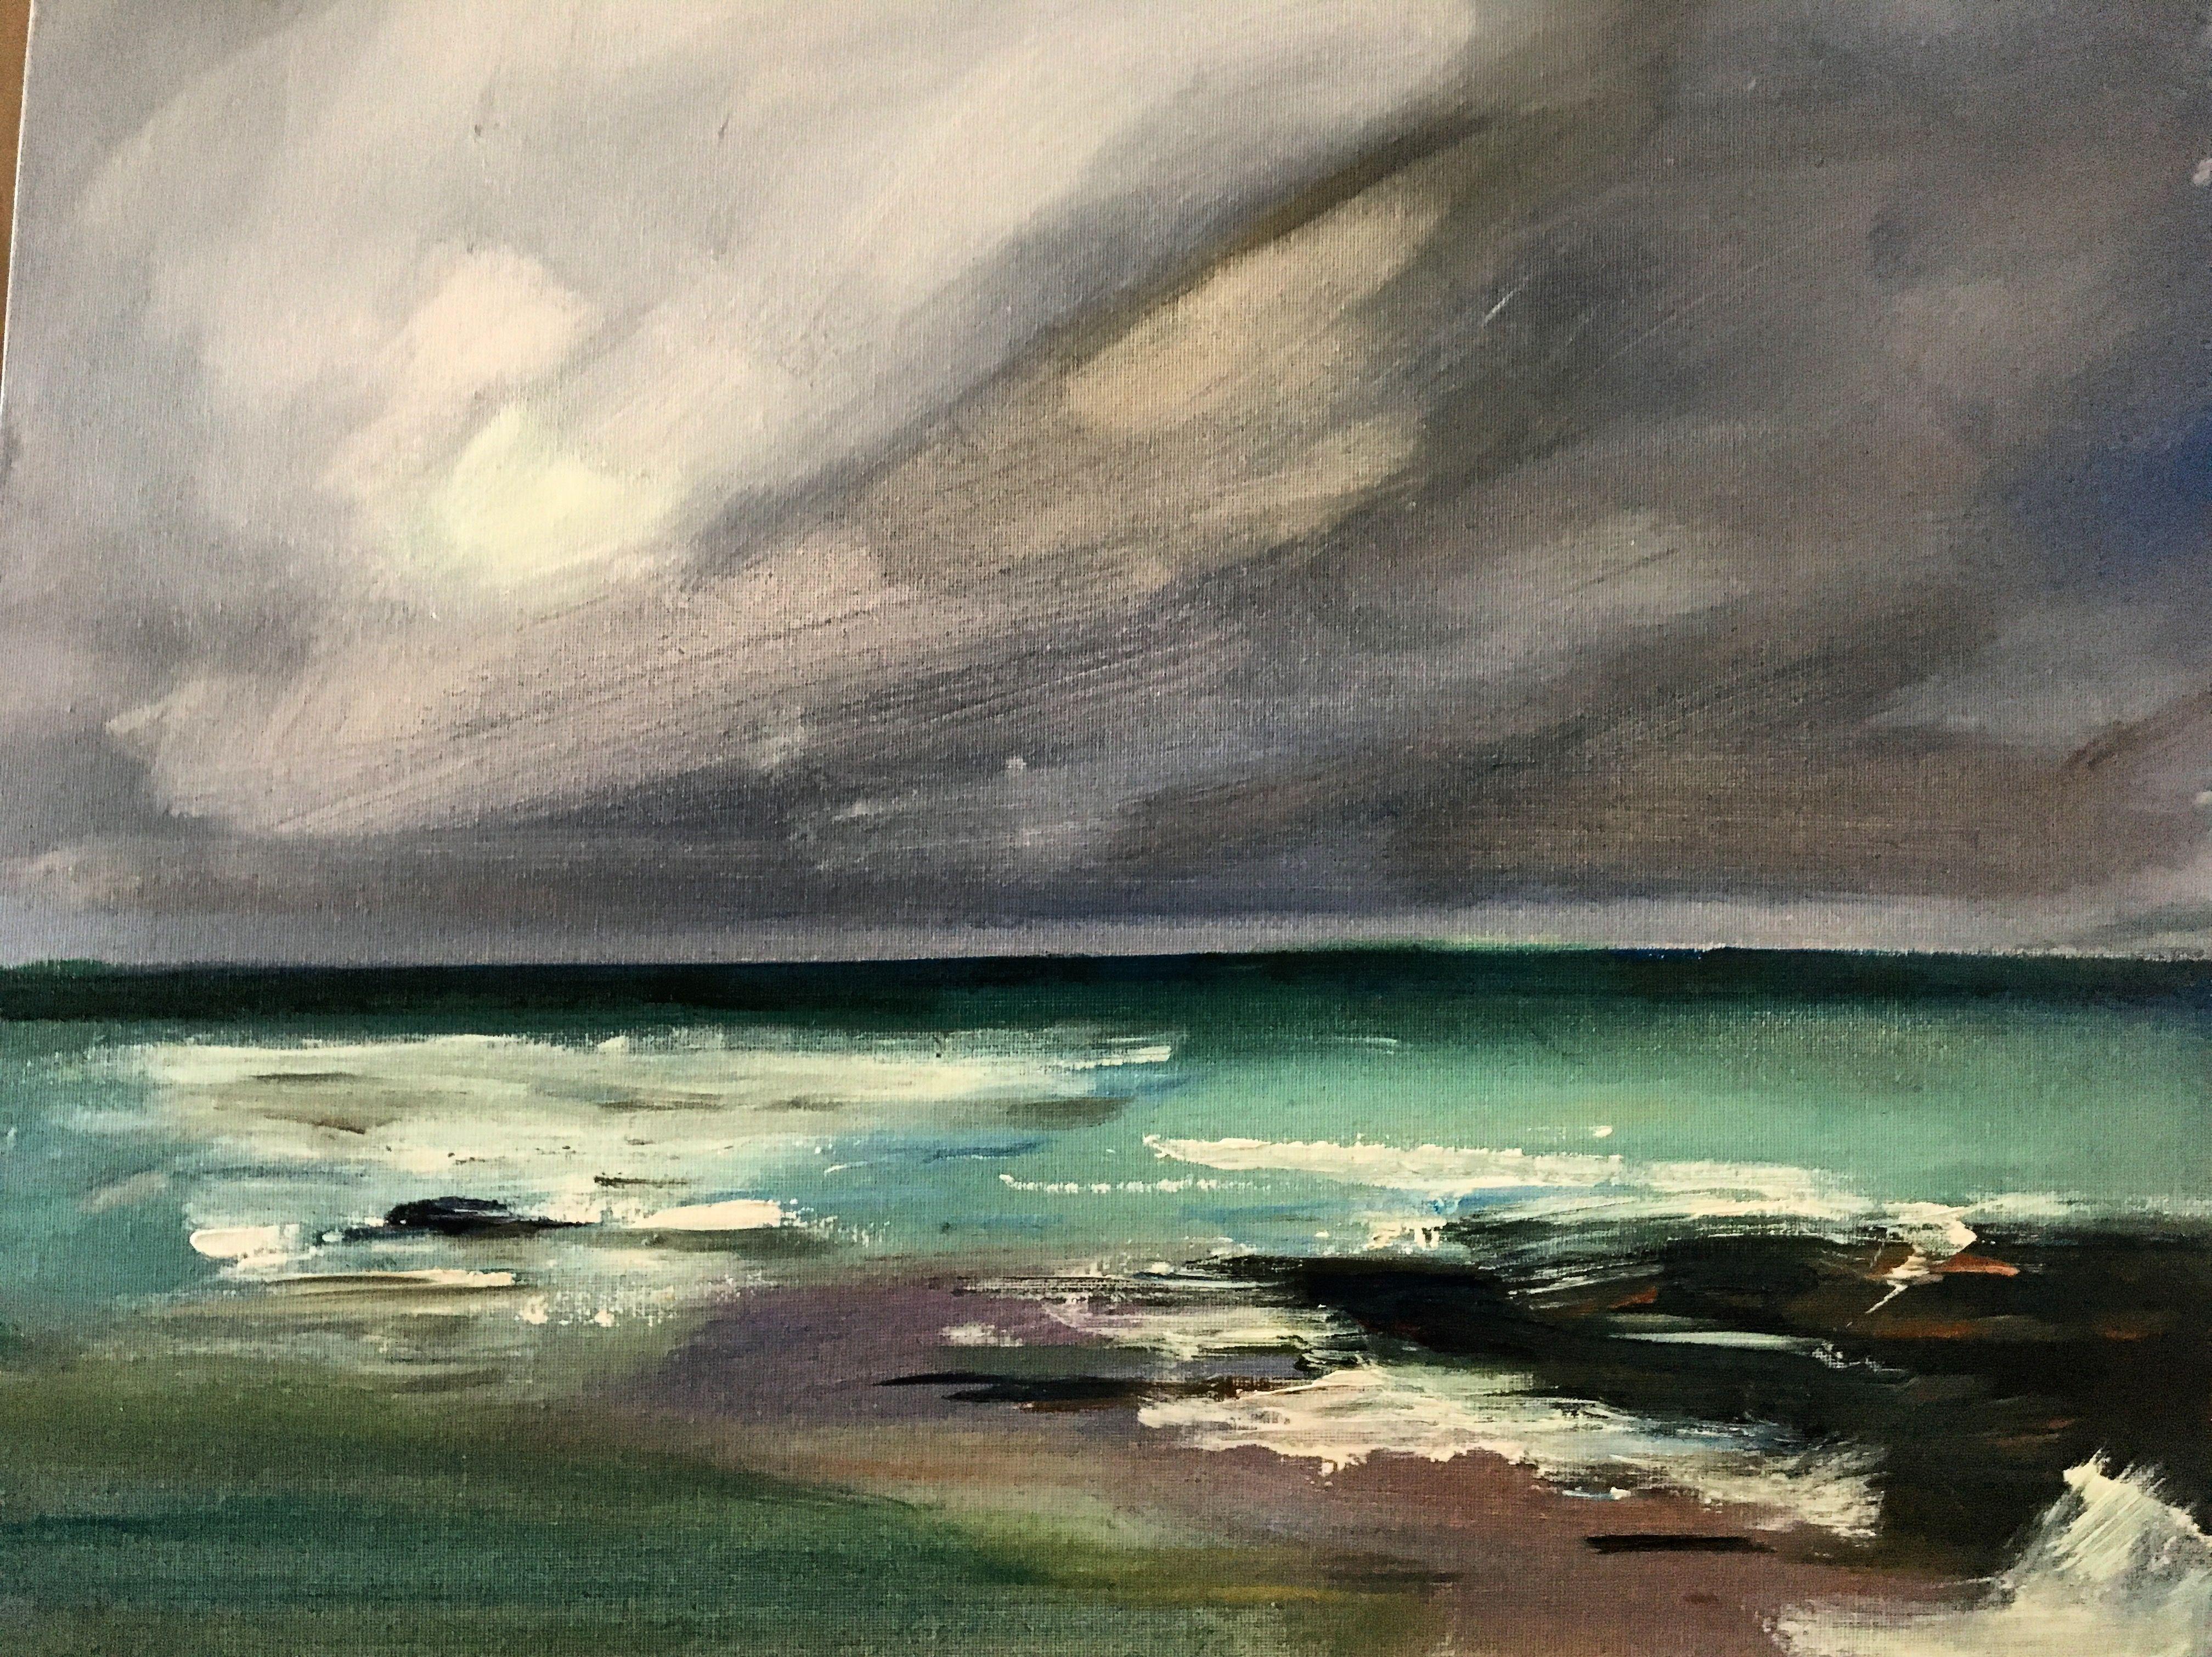 Landscape Sea Wales Wave Painting Acrylic Colours Water Art Crash Large Canvas Oil Paint Wash Slowmo Representation Wave Painting Water Art Landscape Paintings